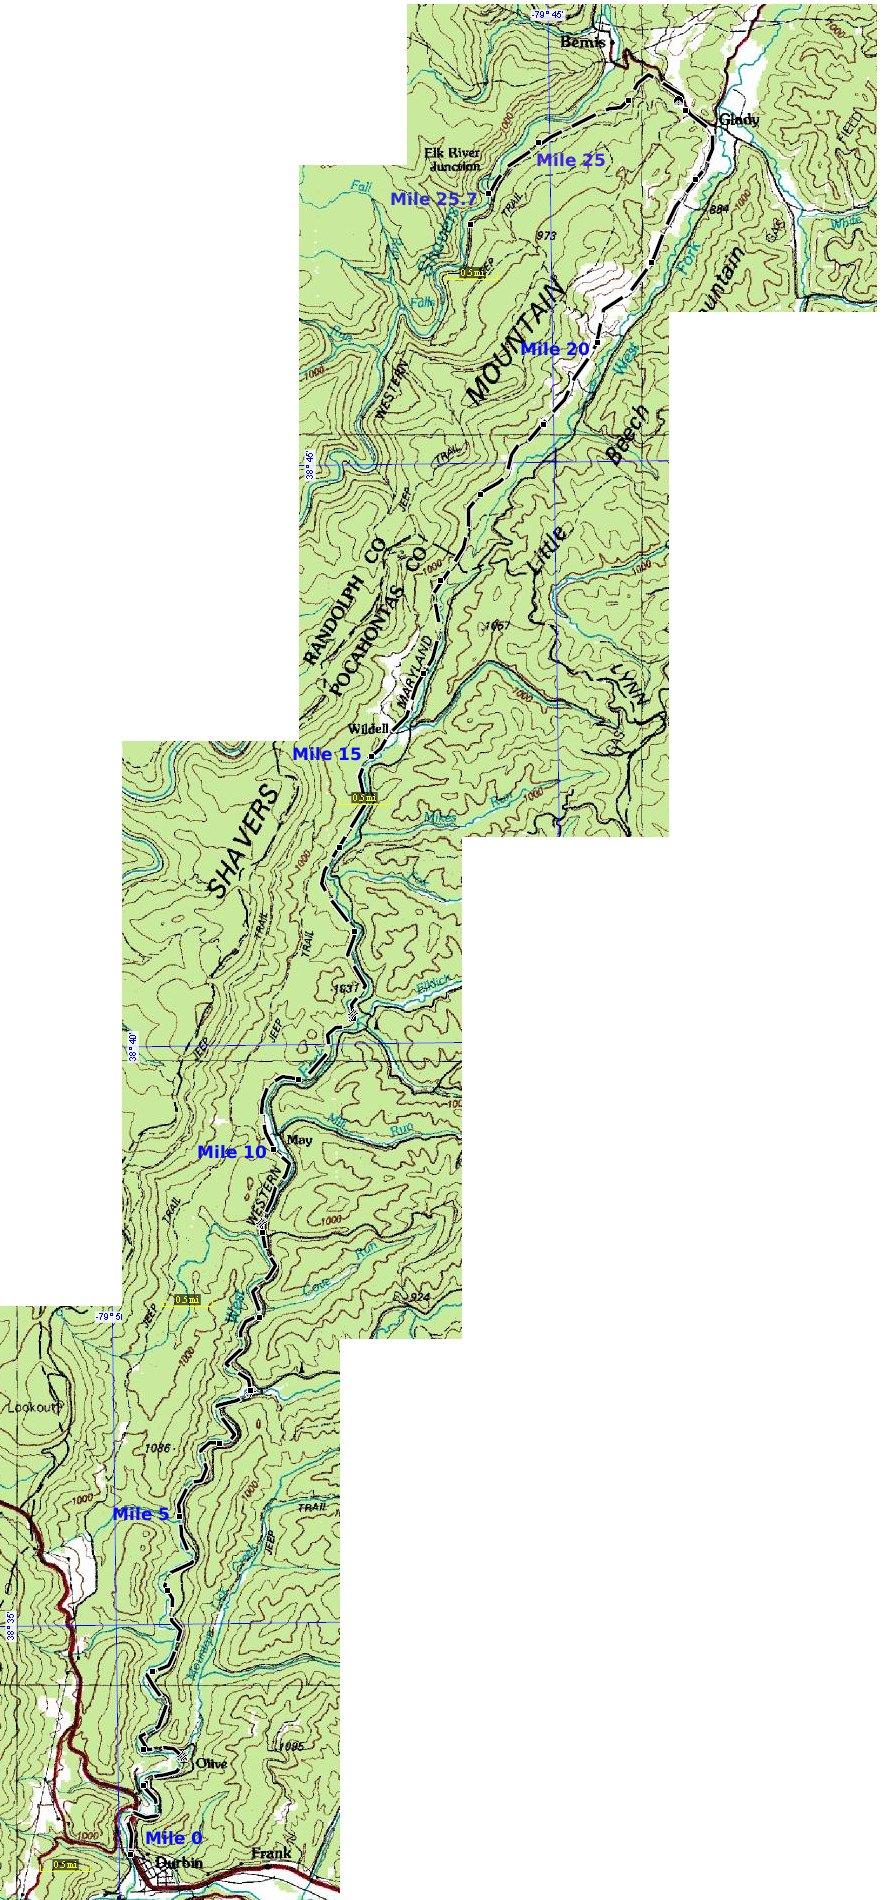 West Fork Trail Maps